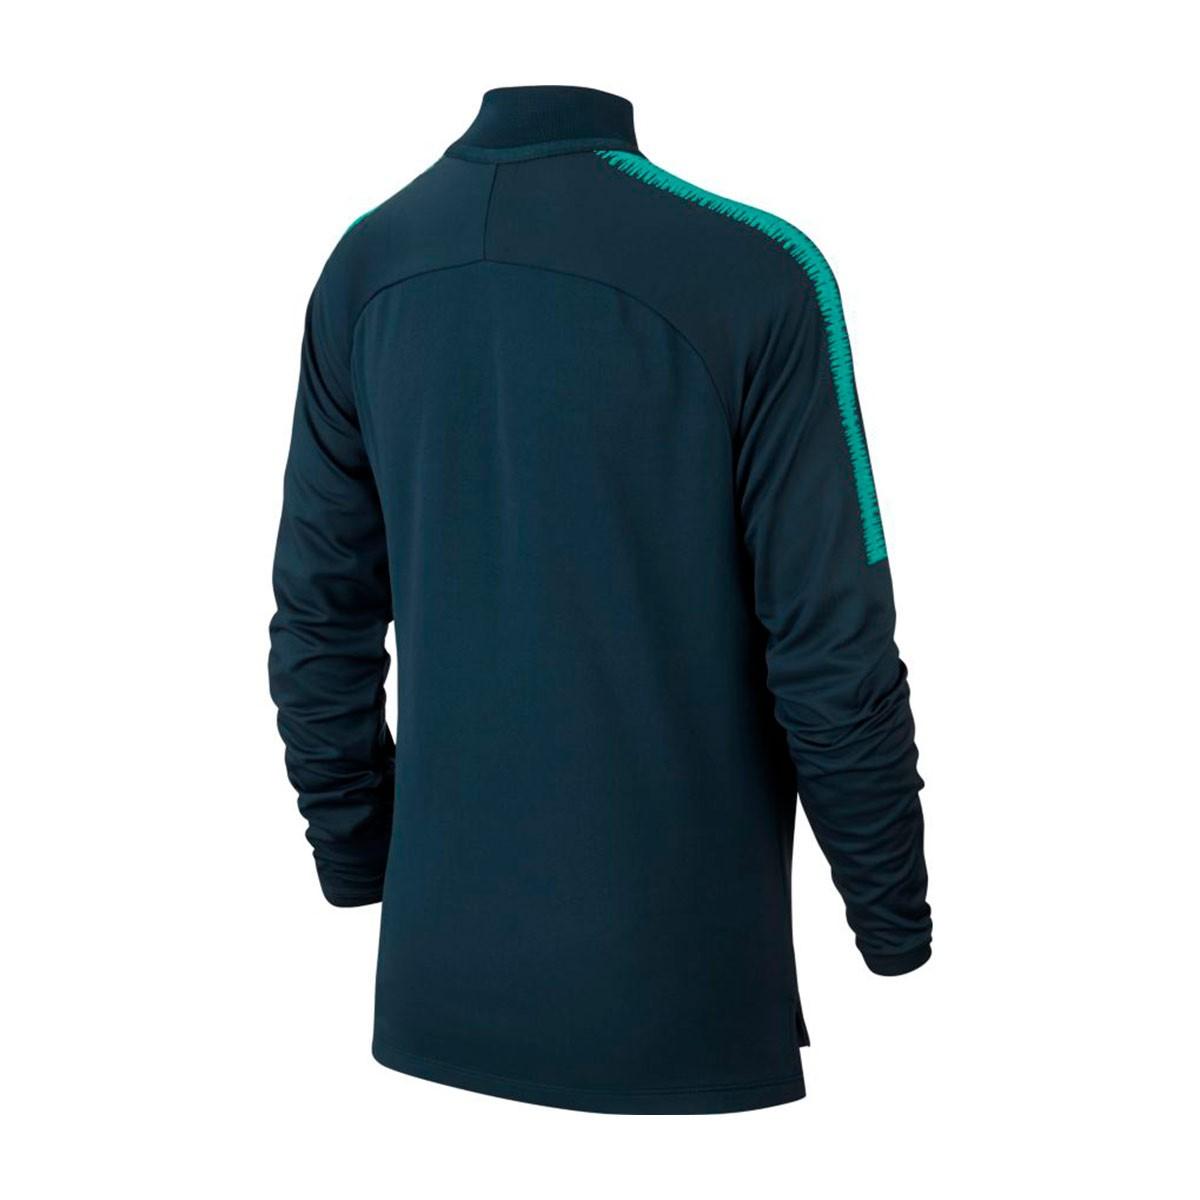 601fed2d4 Sweatshirt Nike Kids Tottenham Hotspur FC Squad 2018-2019 Armory navy-Neptune  green - Football store Fútbol Emotion